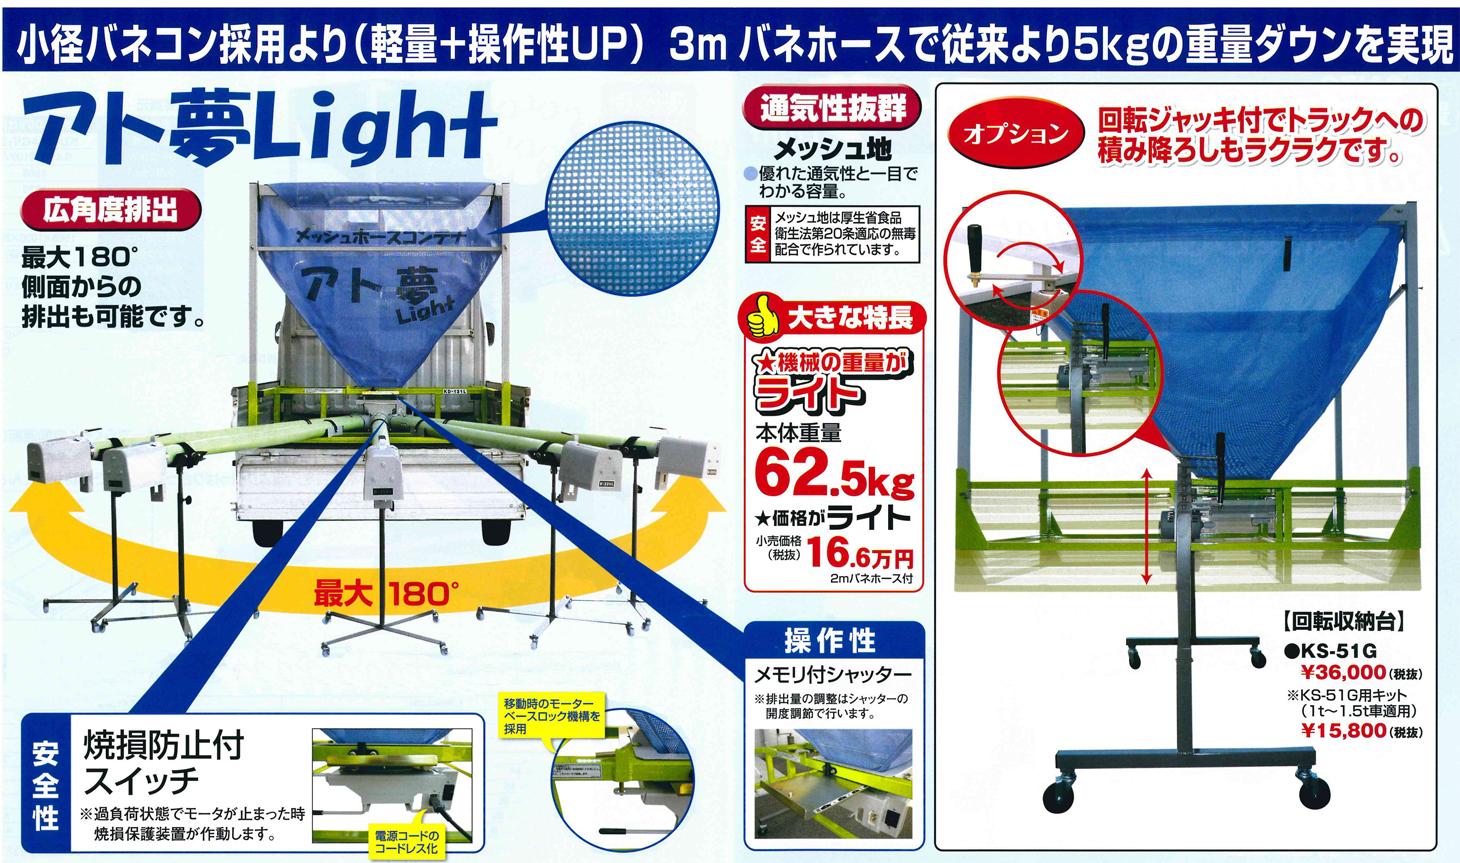 【斉藤農機】アト夢 Light KD-131L